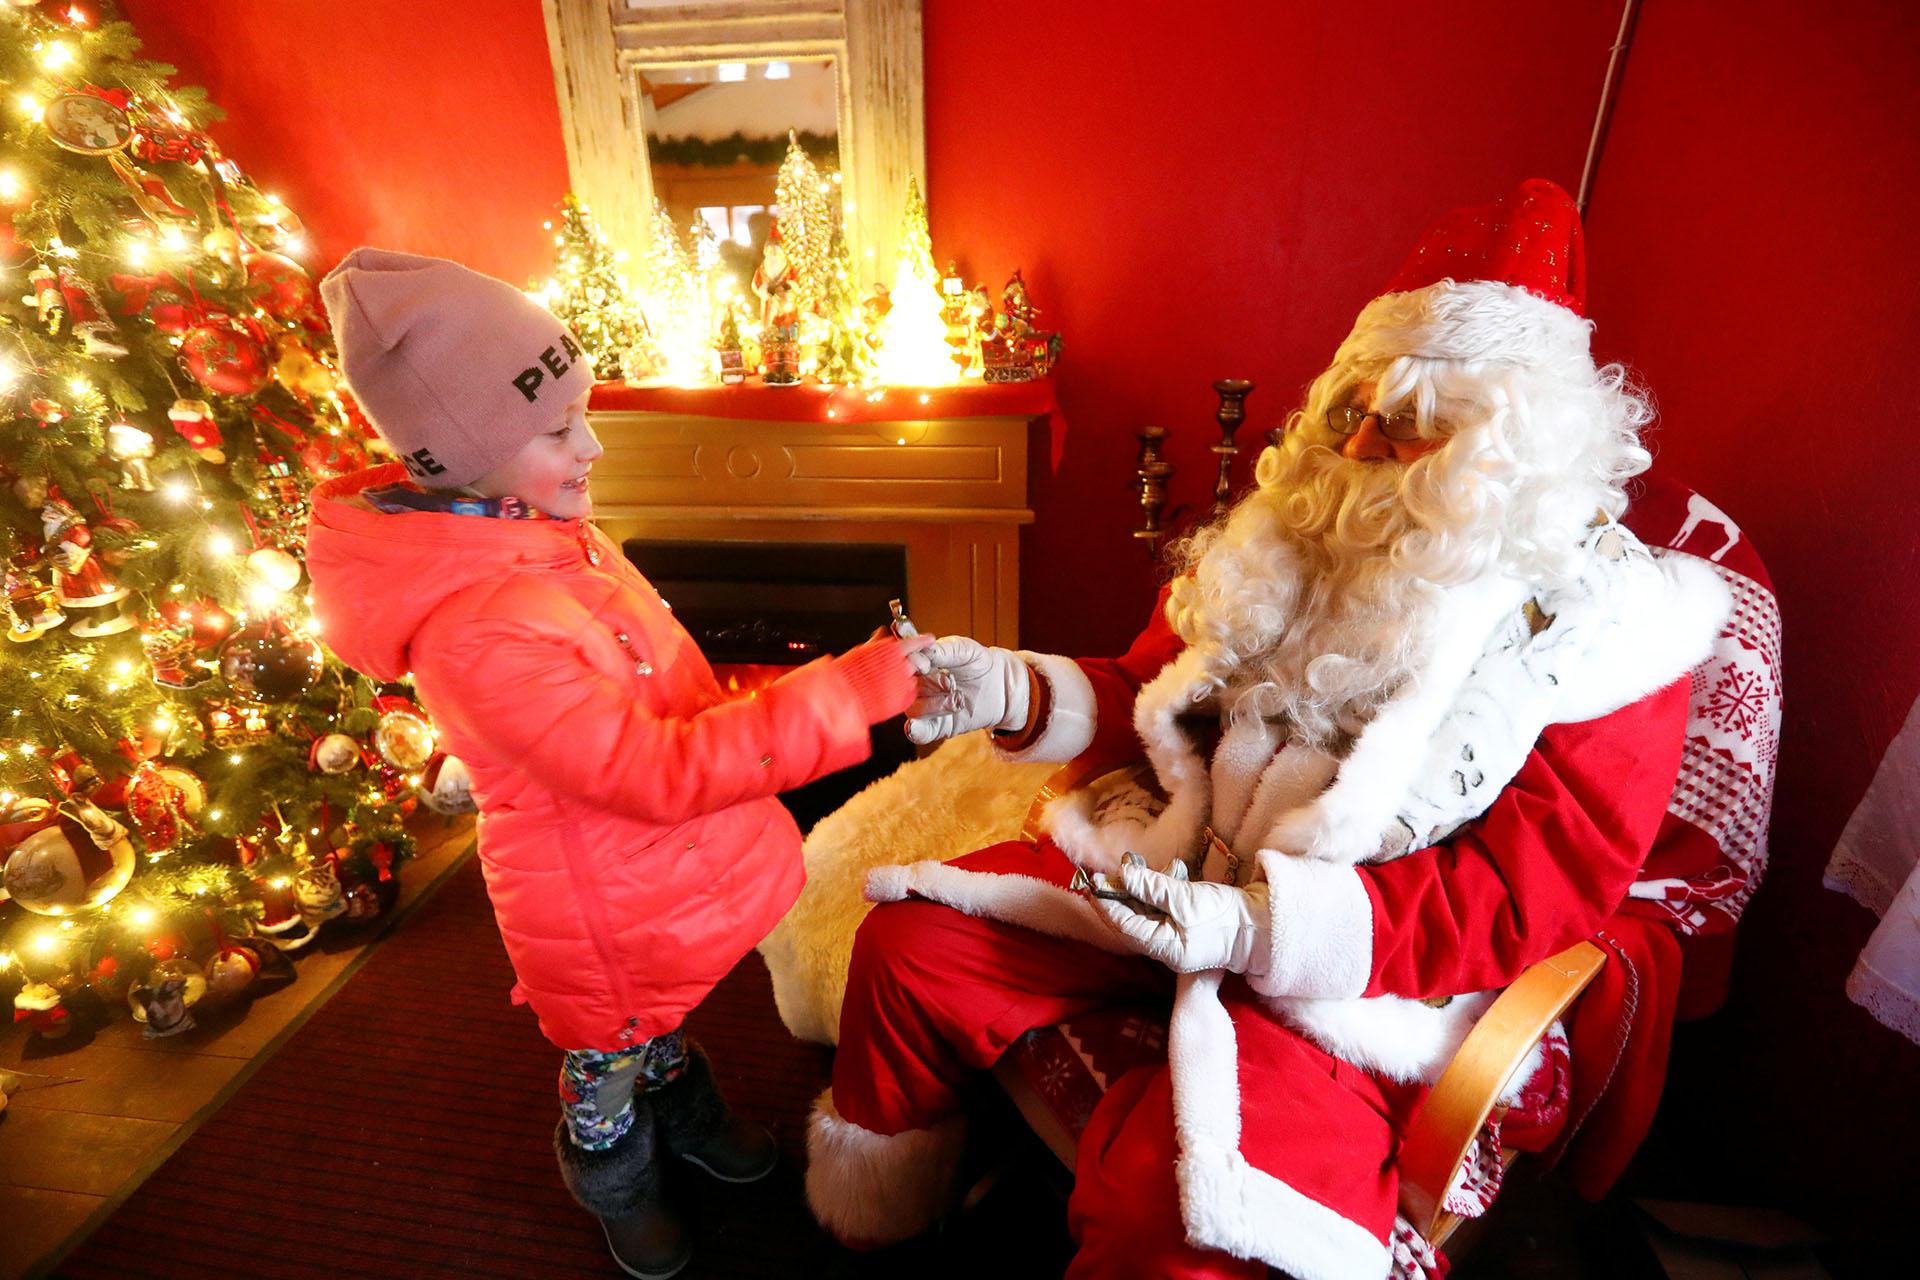 Un hombre vestido de Papá Noel da dulces a una niña en Tallinn, Estonia 18 de diciembre de 2017. (Reuters)